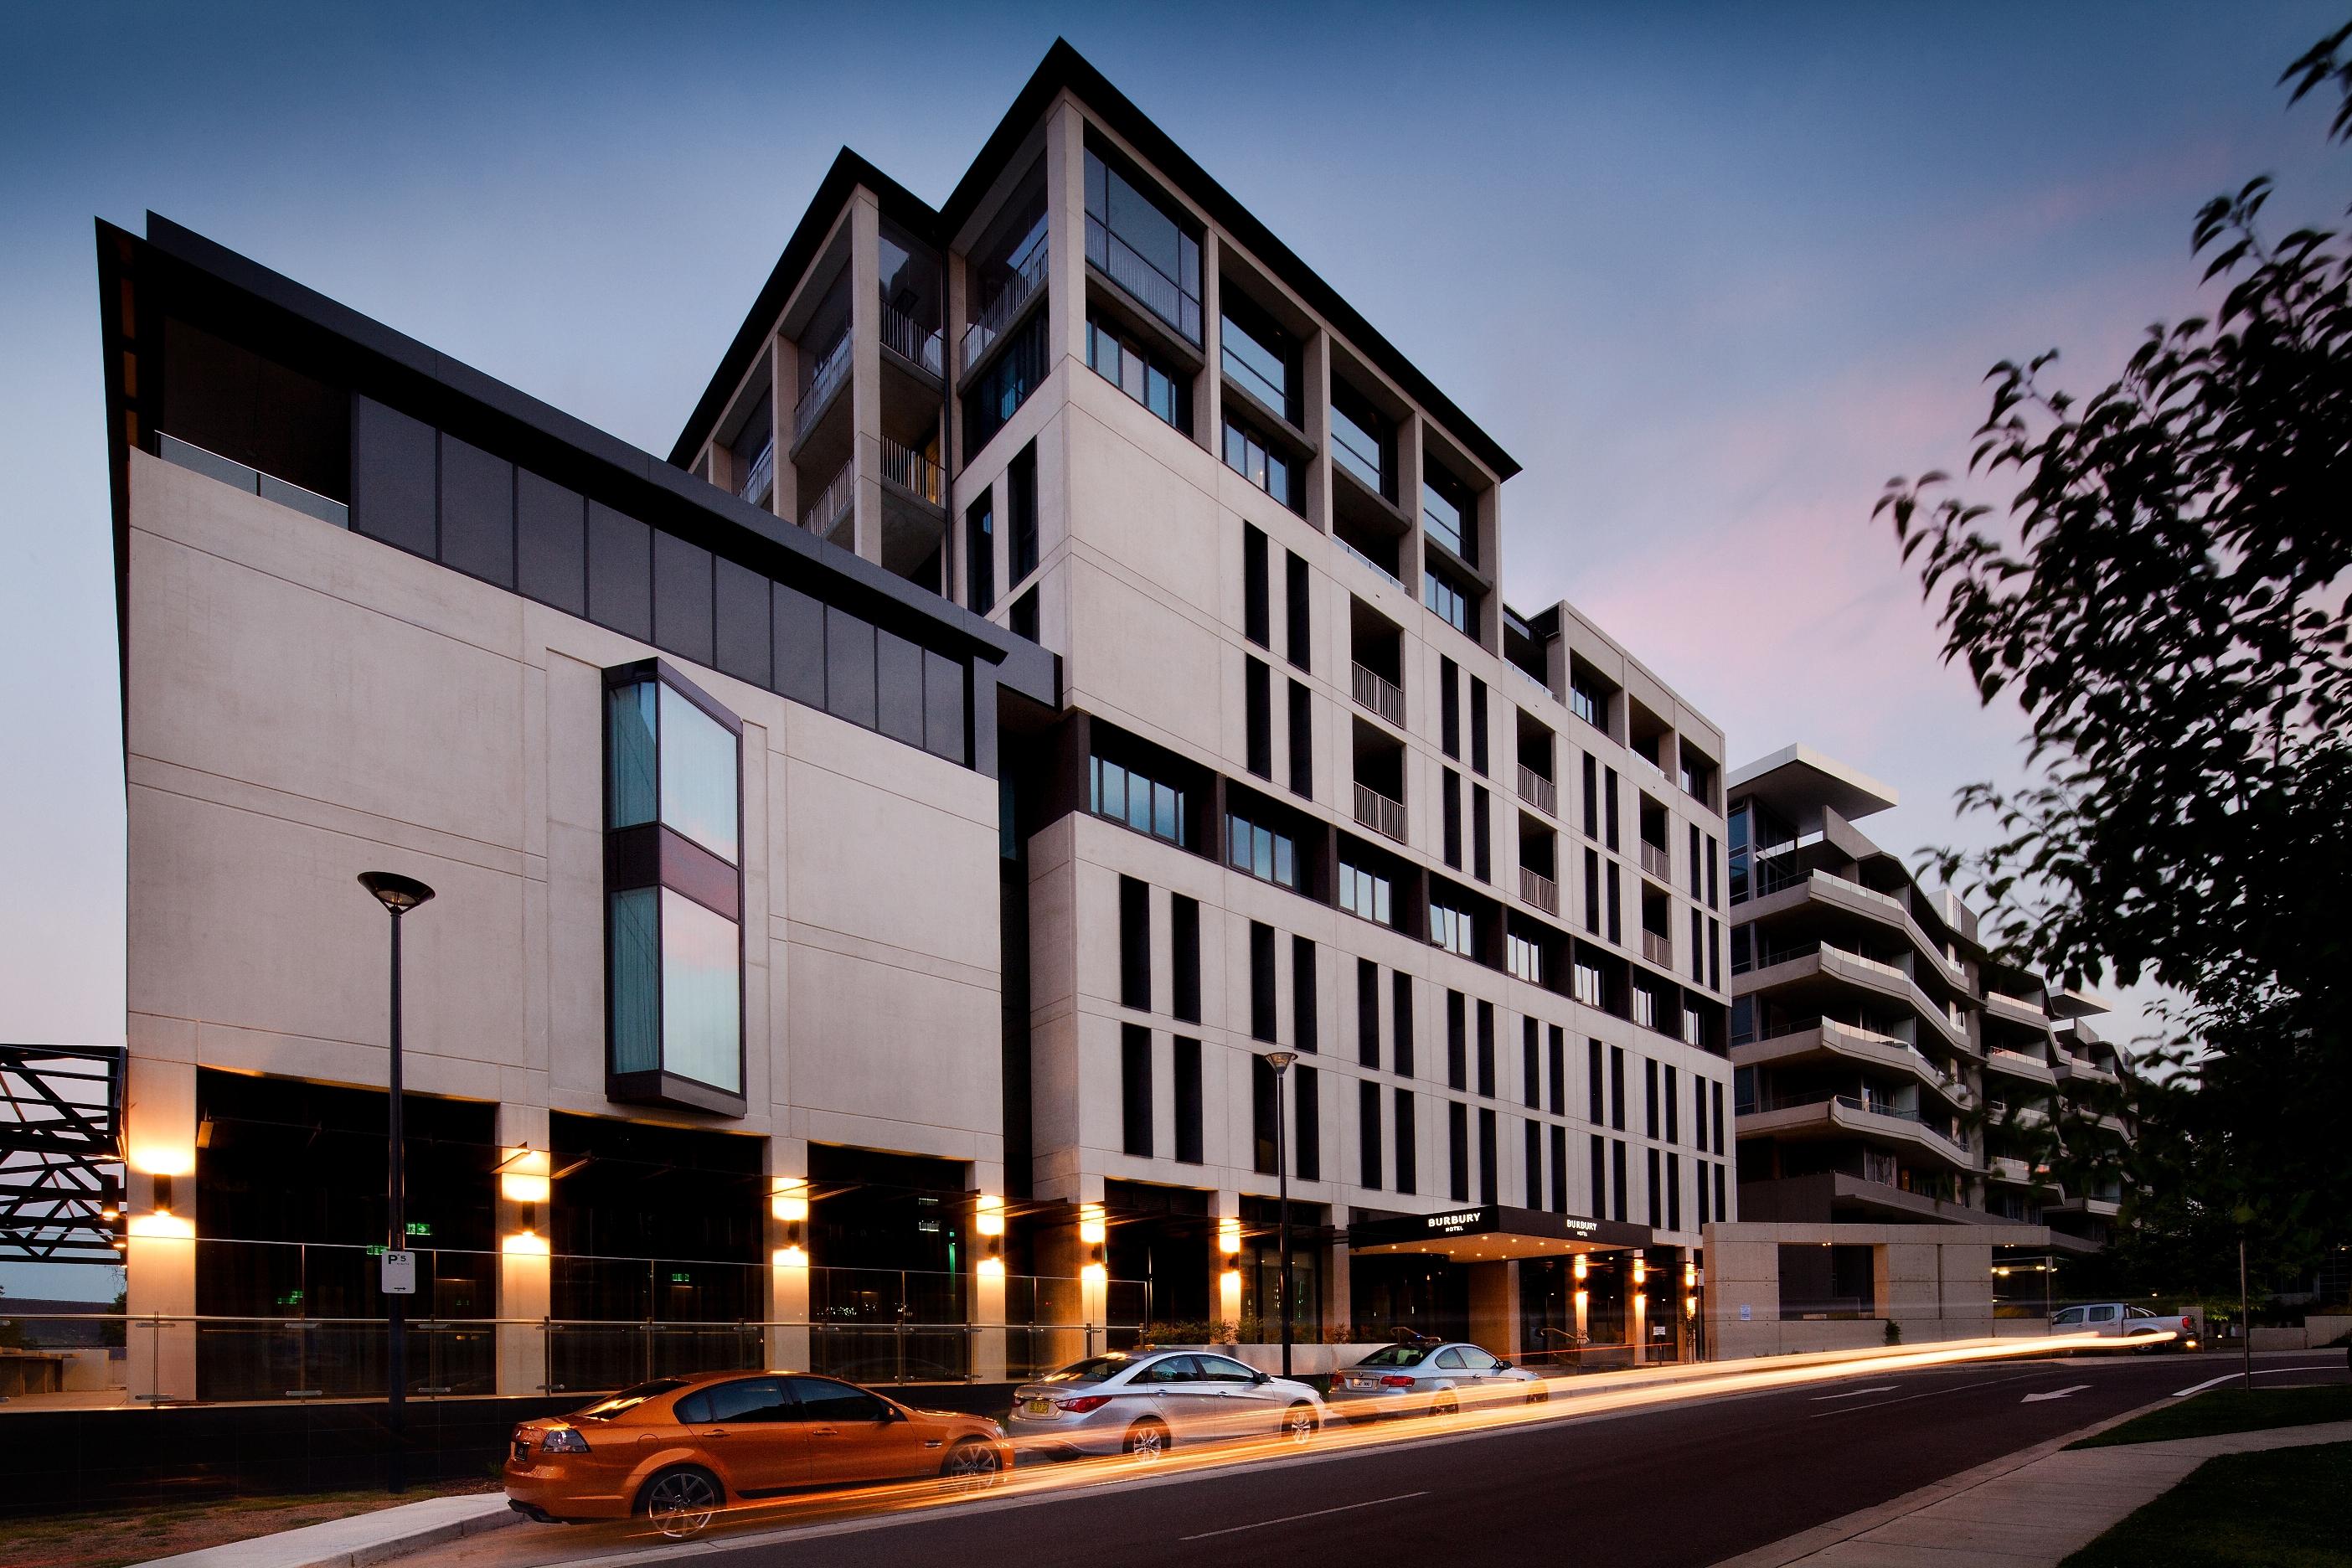 Burbury Hotel Barton Canberra Colin Stewart Architects